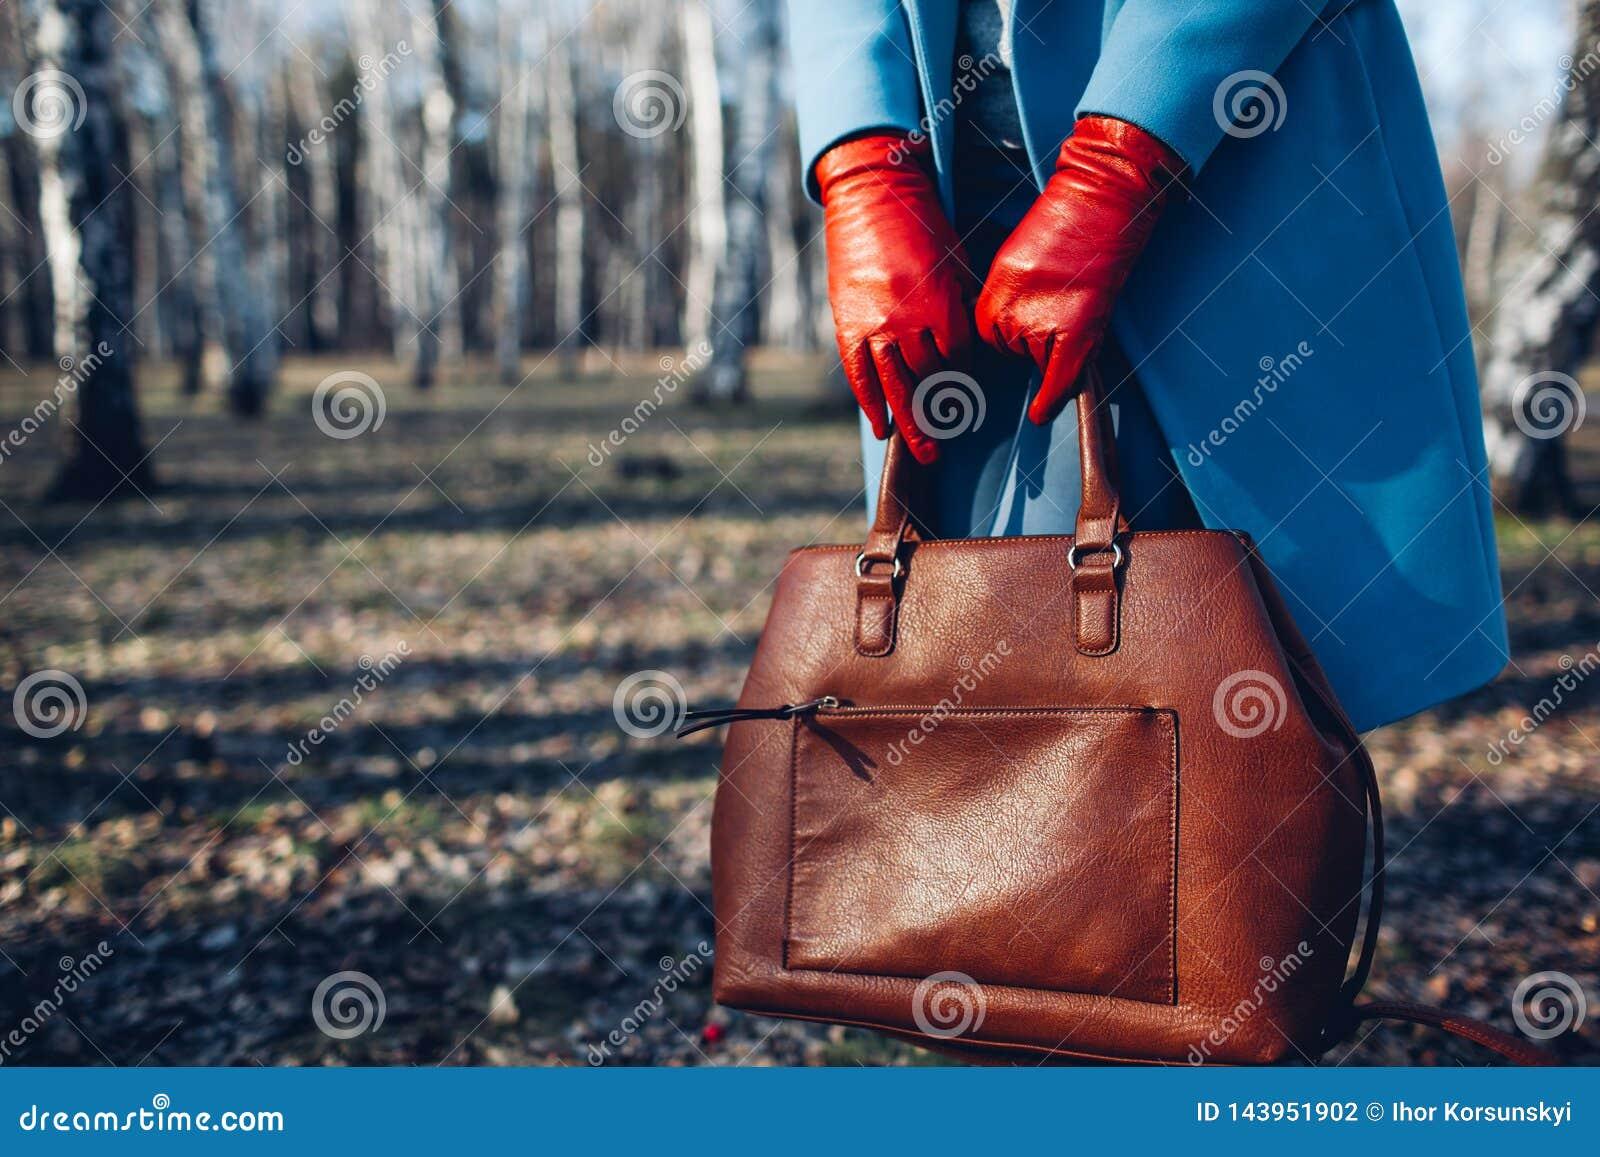 Beauty and fashion. Stylish fashionable woman wearing bright dress holding brown bag handbag